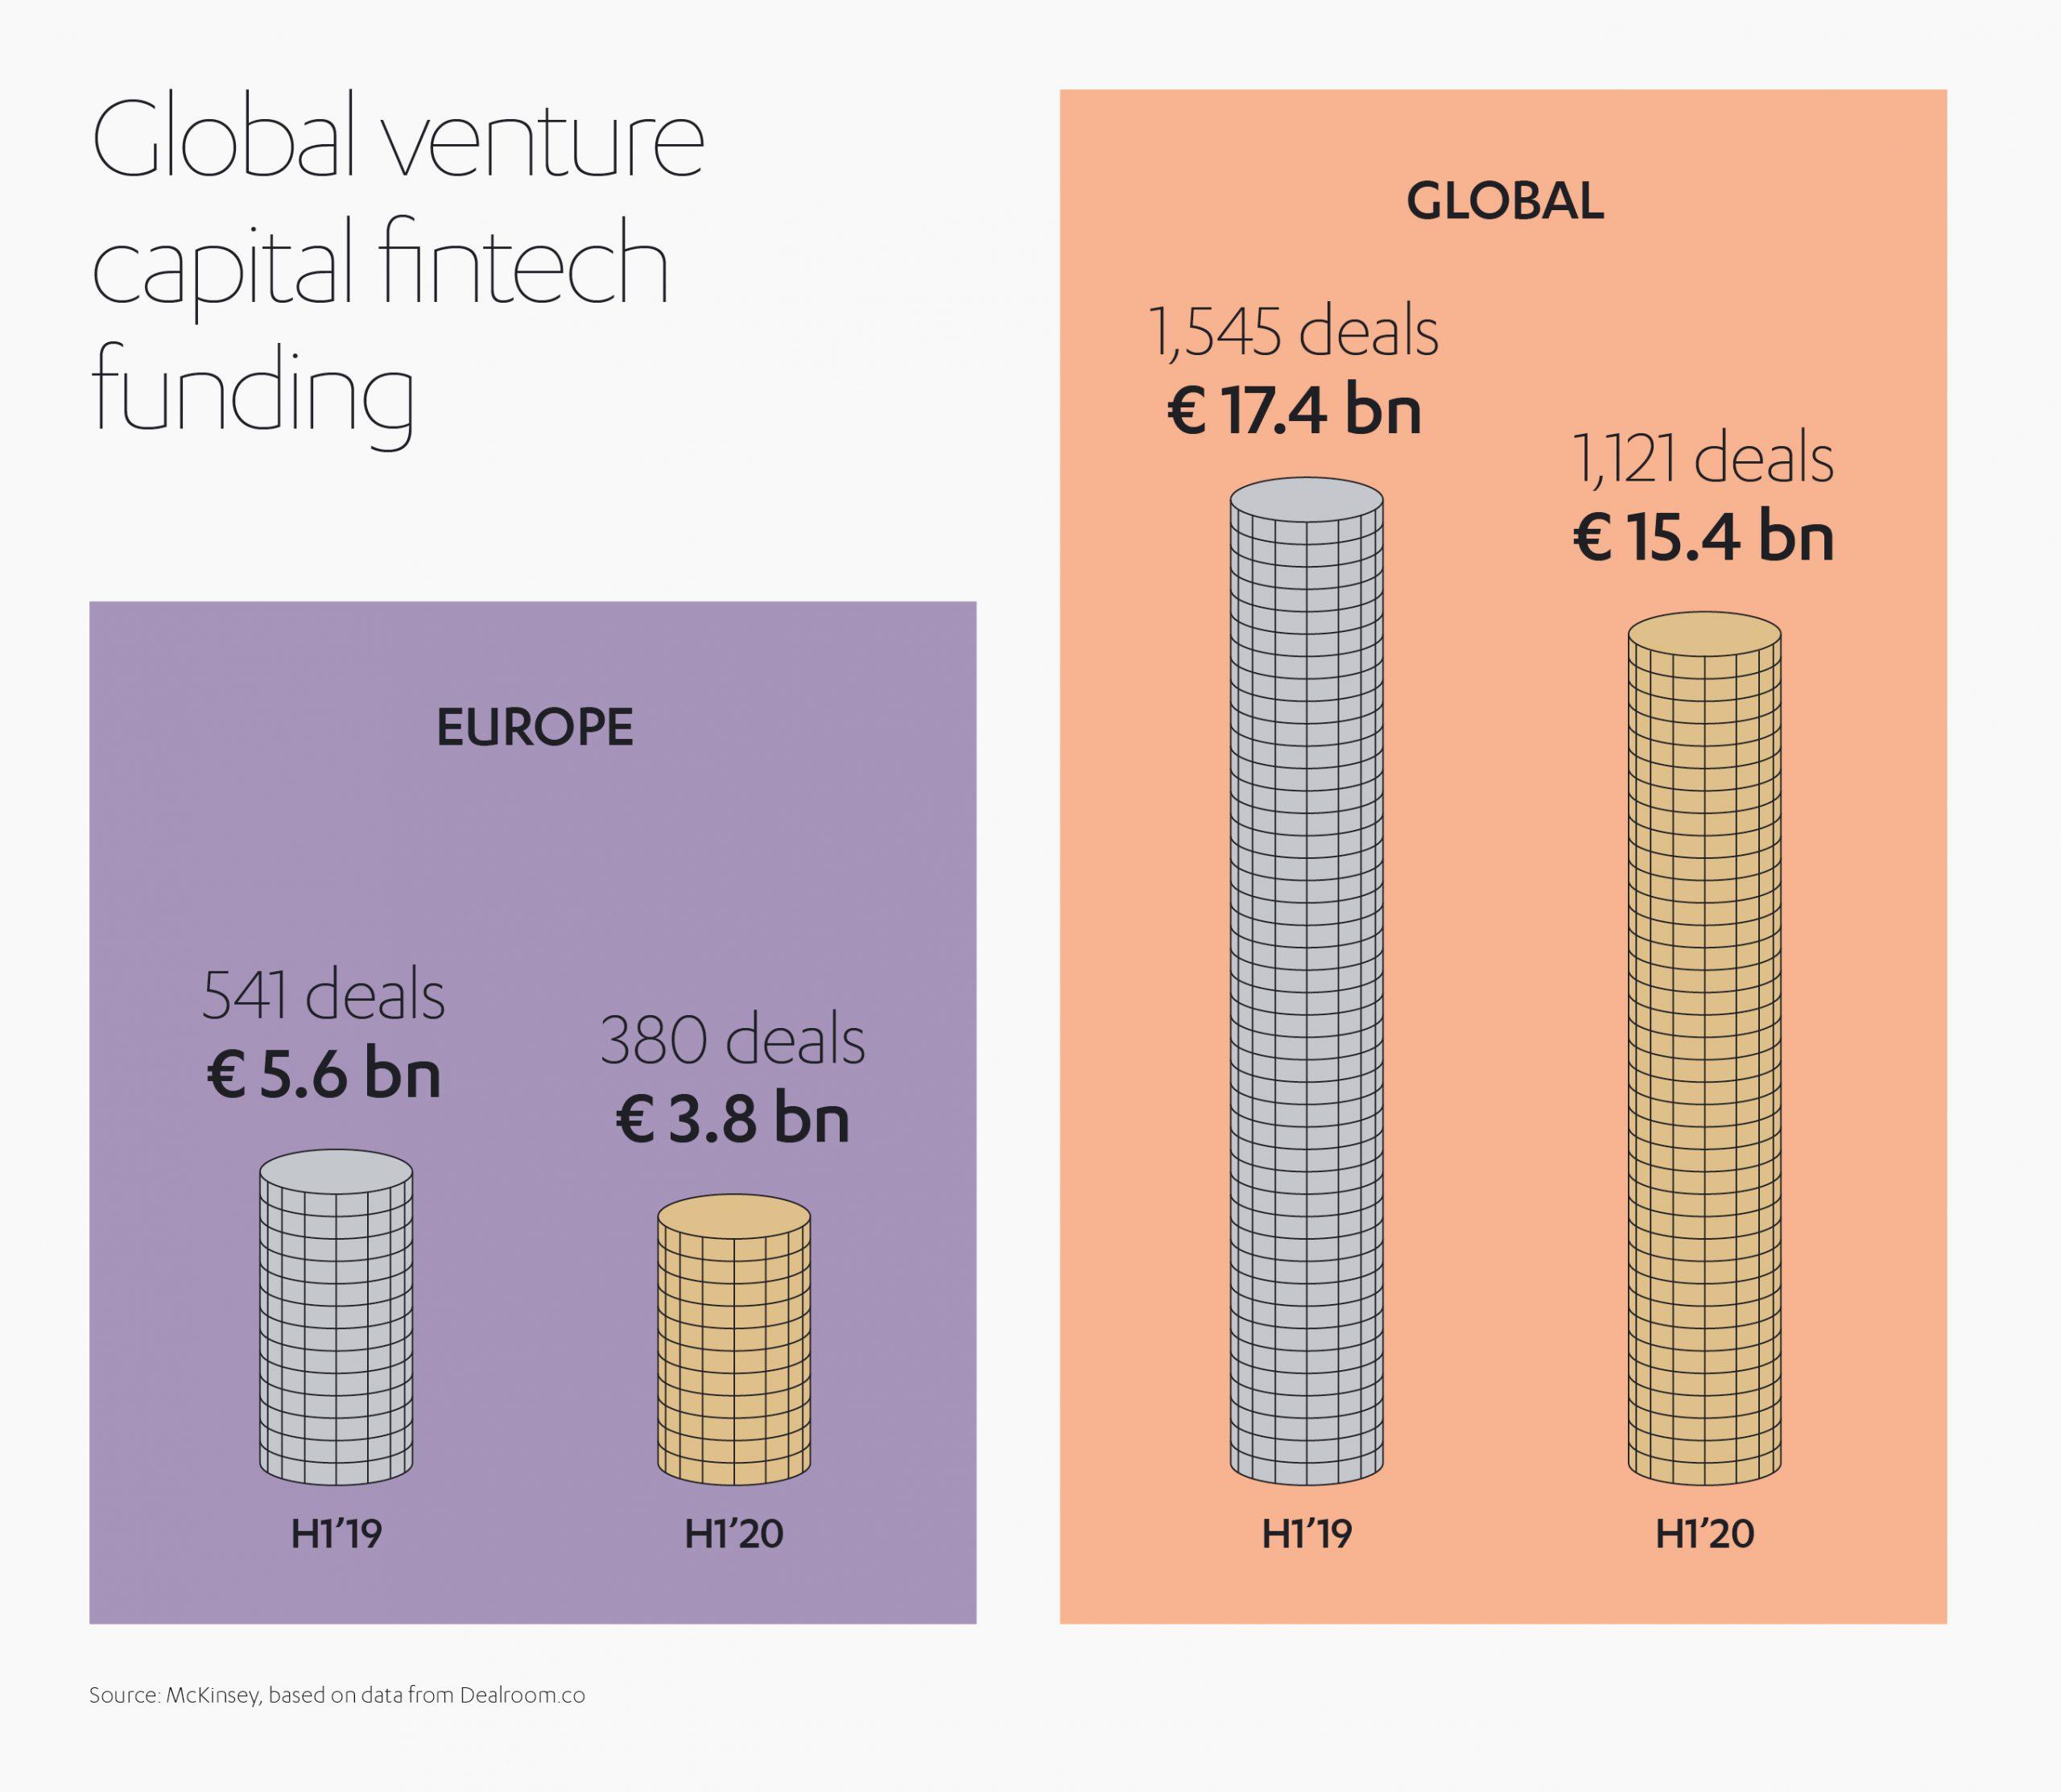 ALJ Financial Services Global Venture